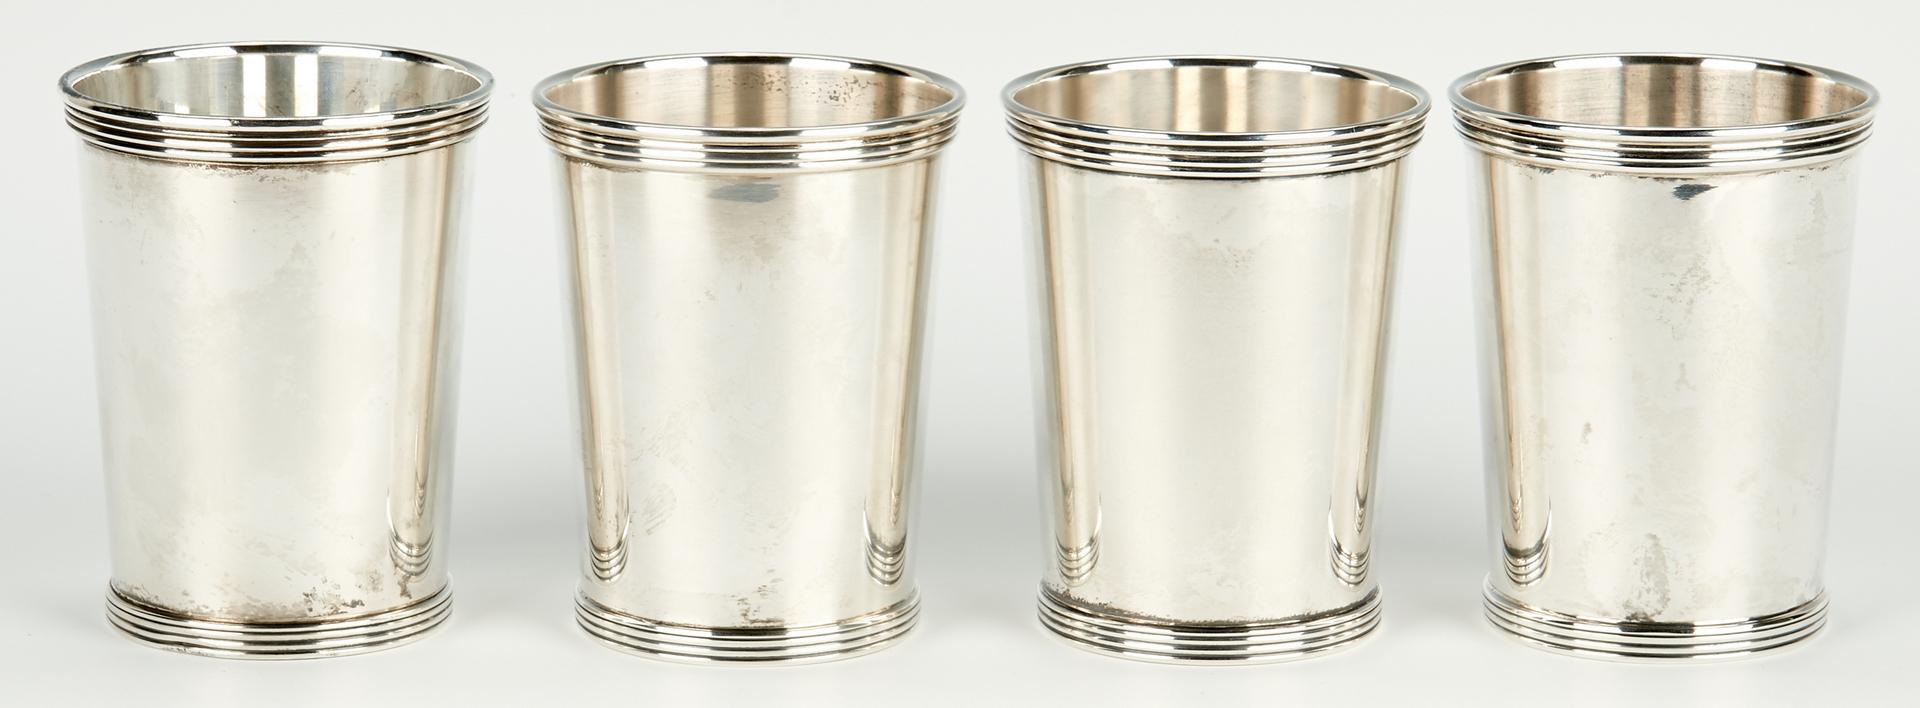 Lot 796: 9 International Silver Mint Julep Cups